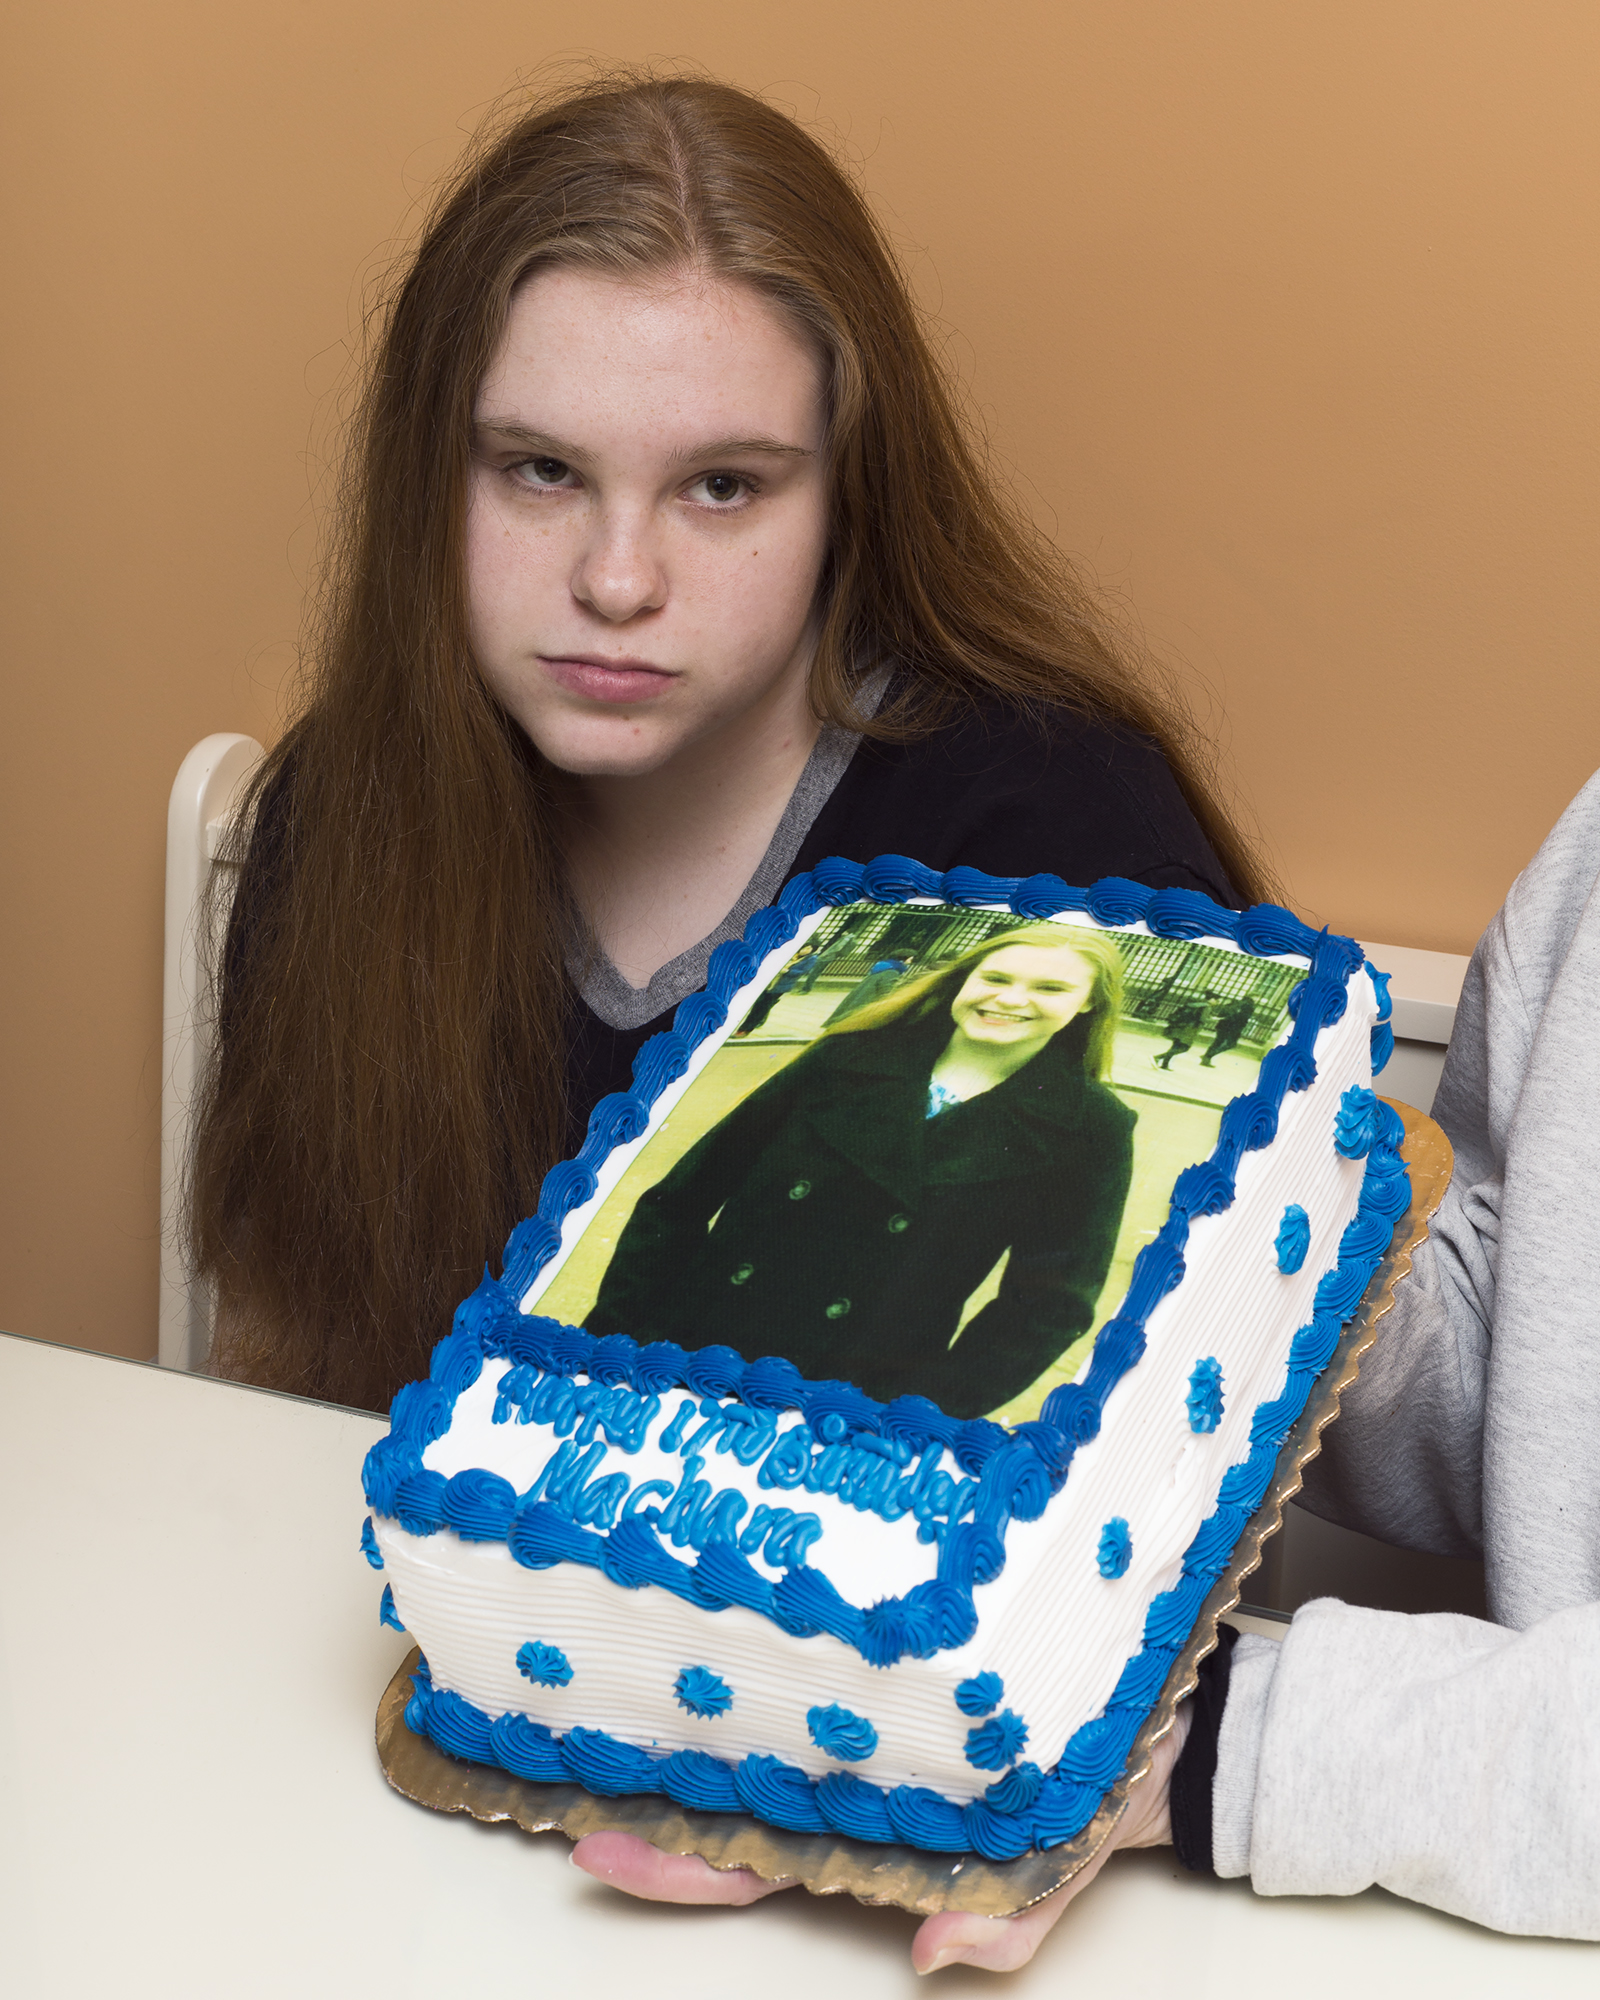 Cake, 2018